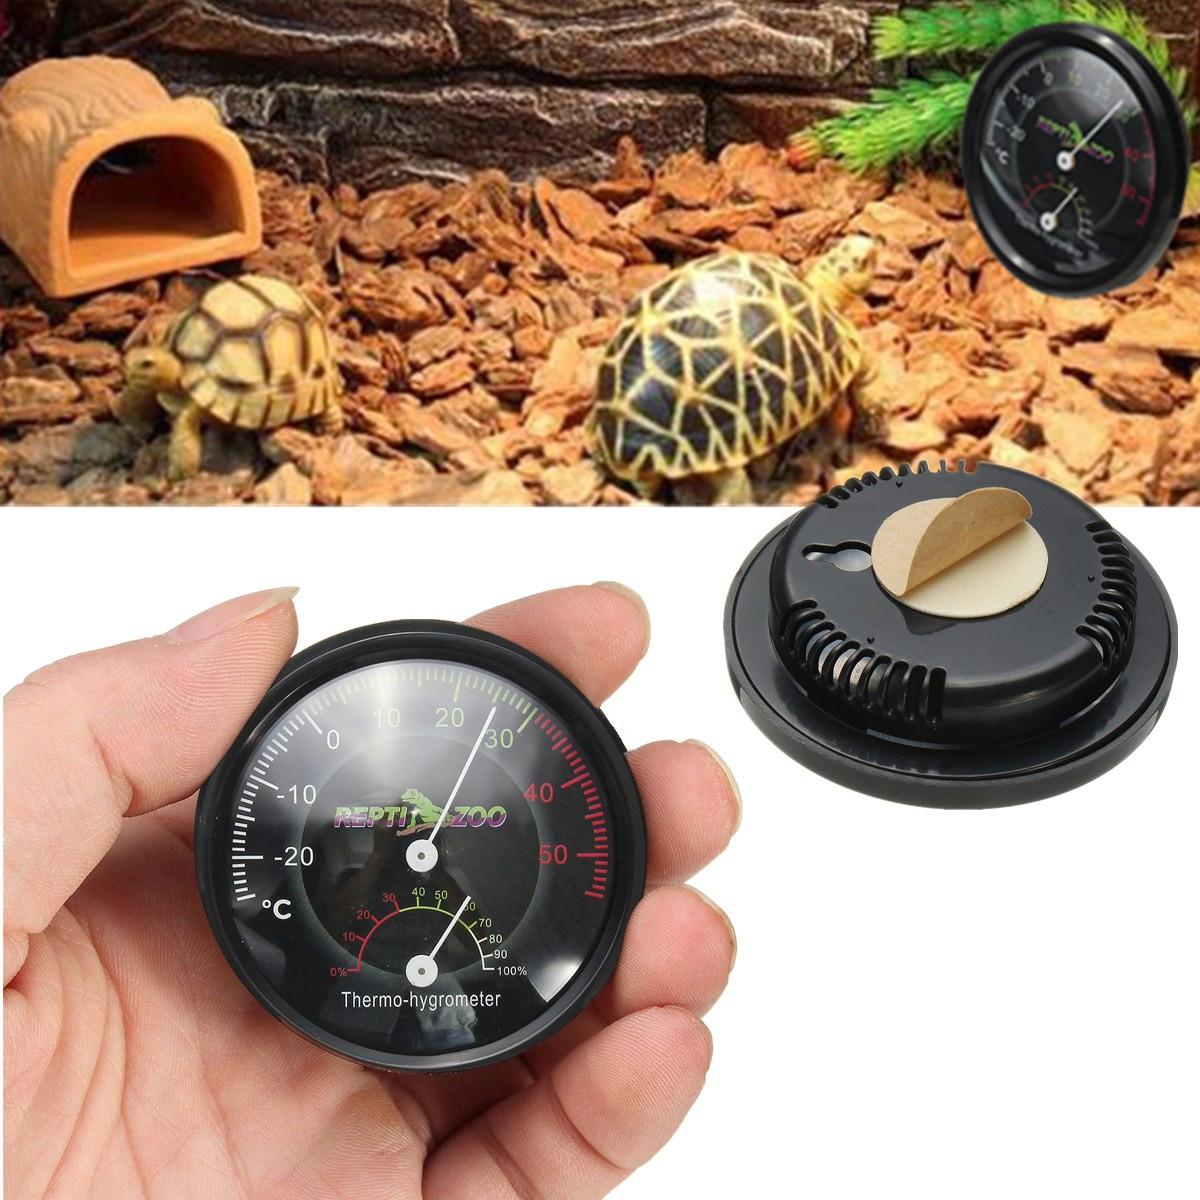 2 In 1 Reptile Terrarium Thermometer Humidity Gauge